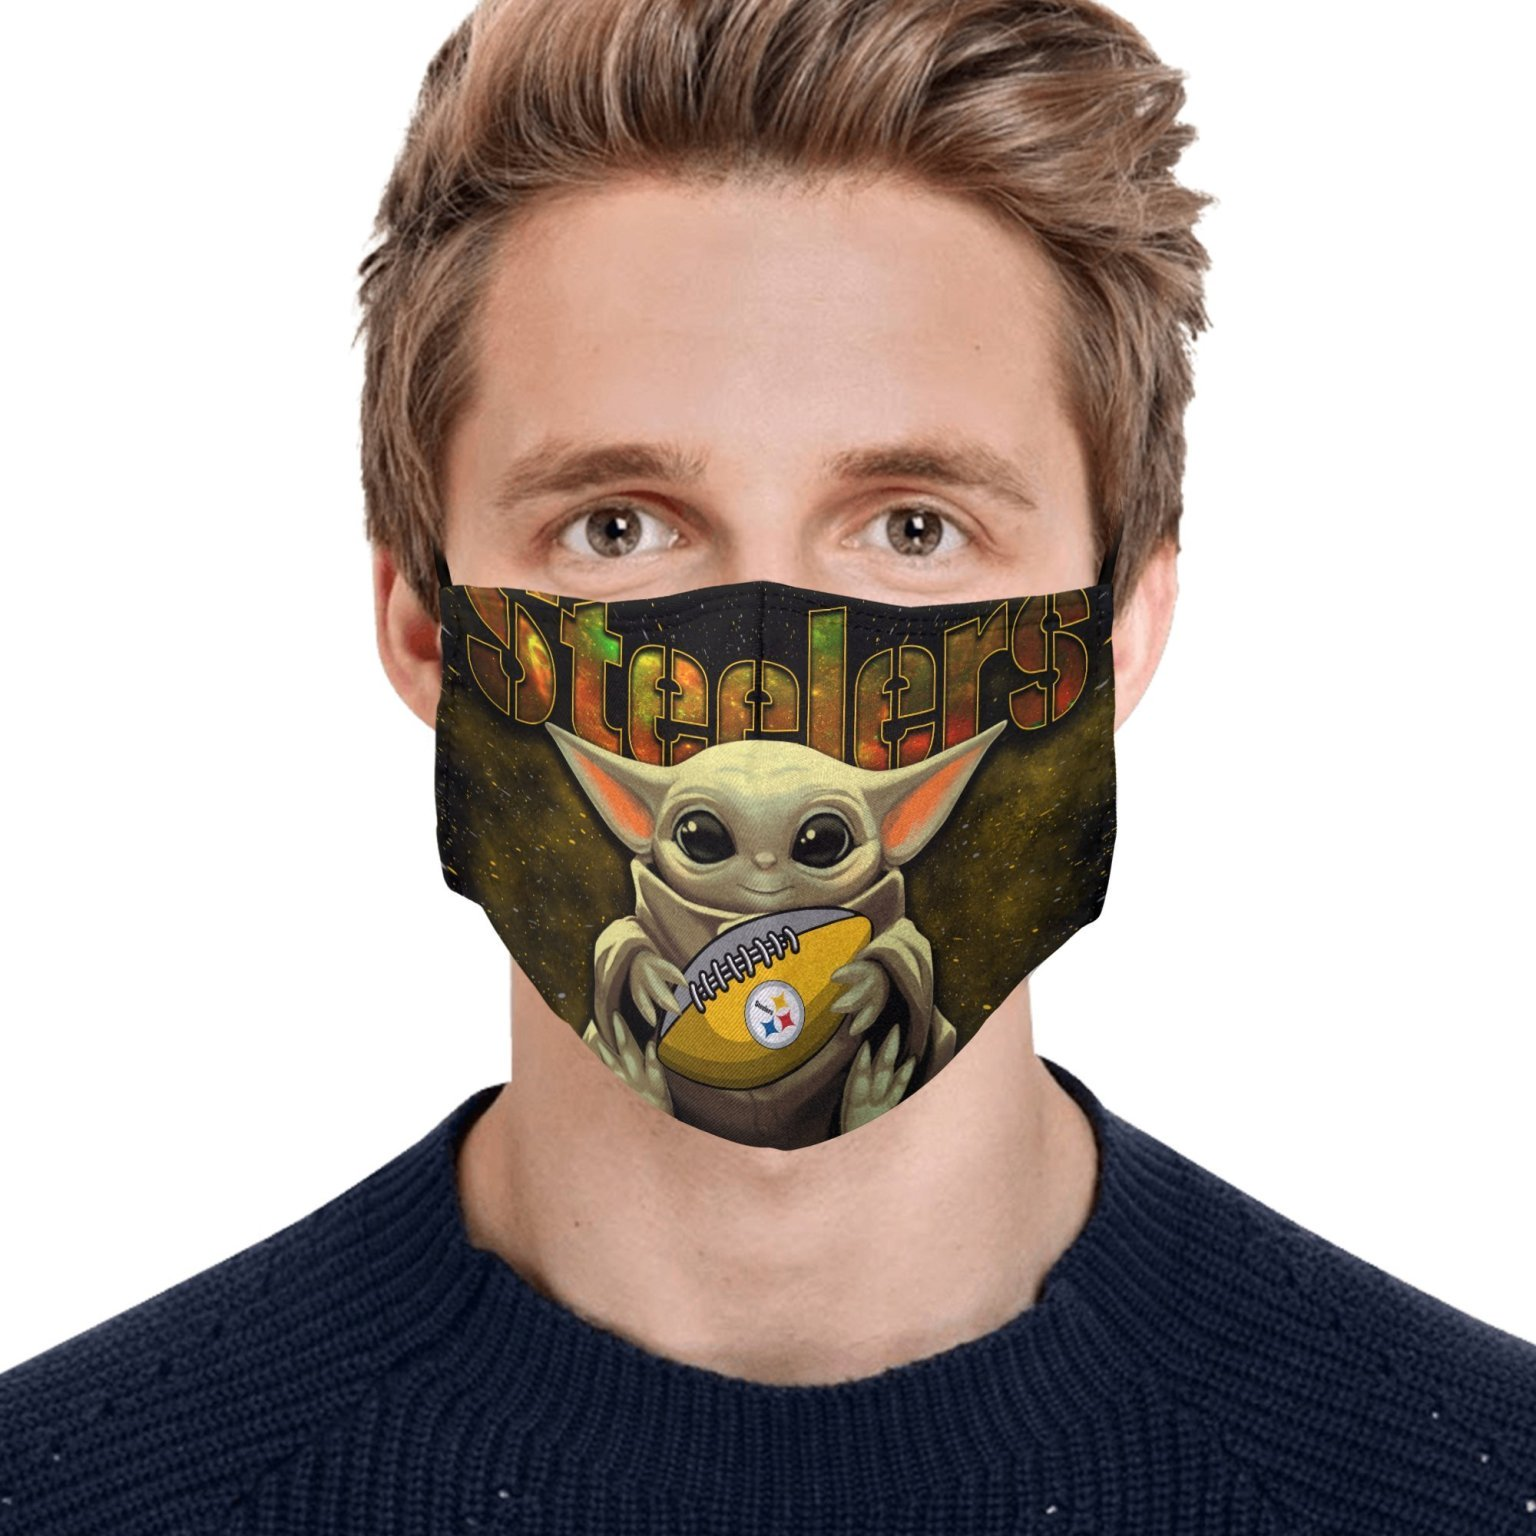 Baby Yoda Hugs Pittsburgh Steelers Face Mask